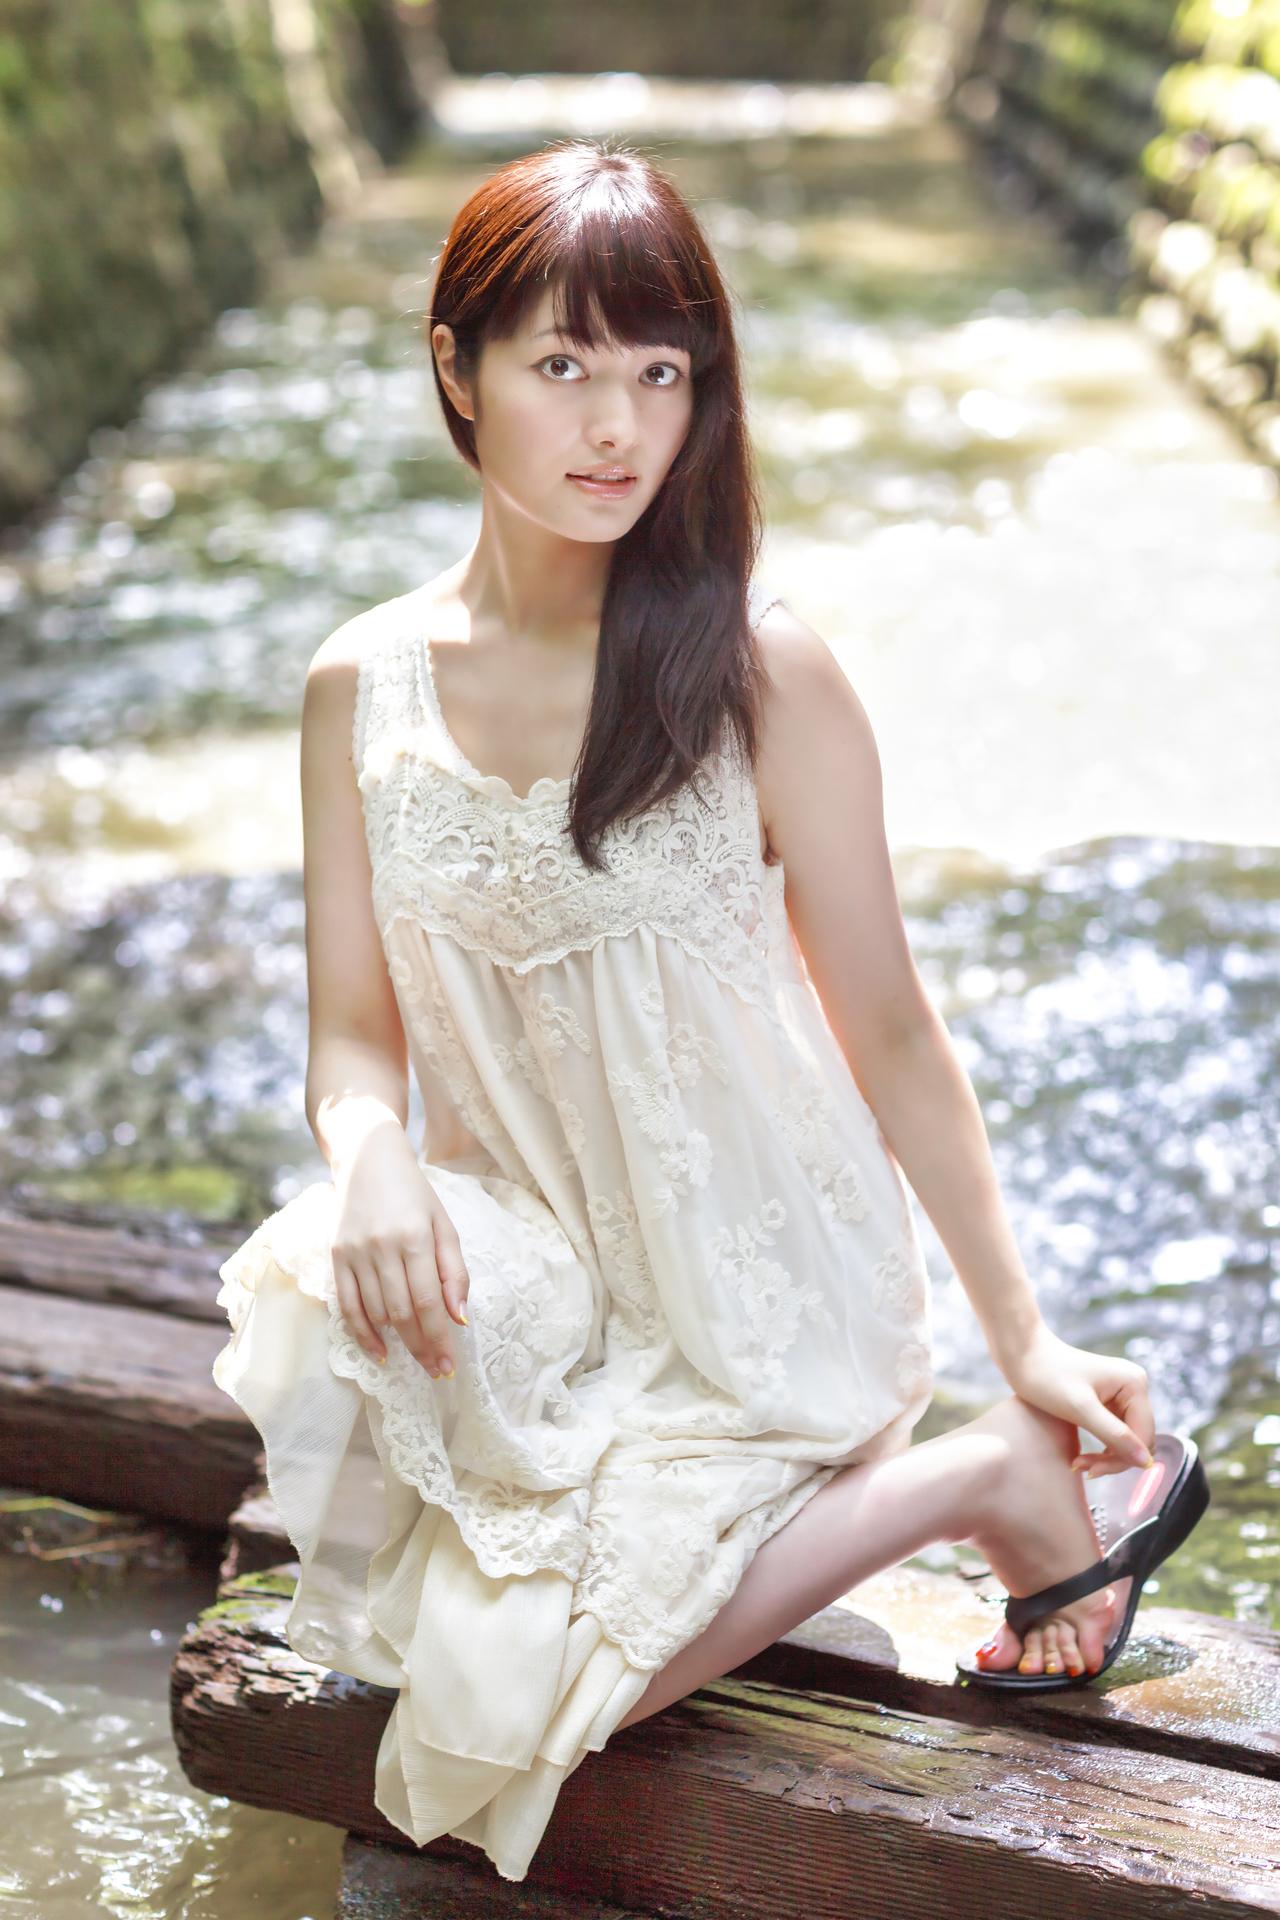 Photo】等々力渓谷 / 南知里 - pepe's blog